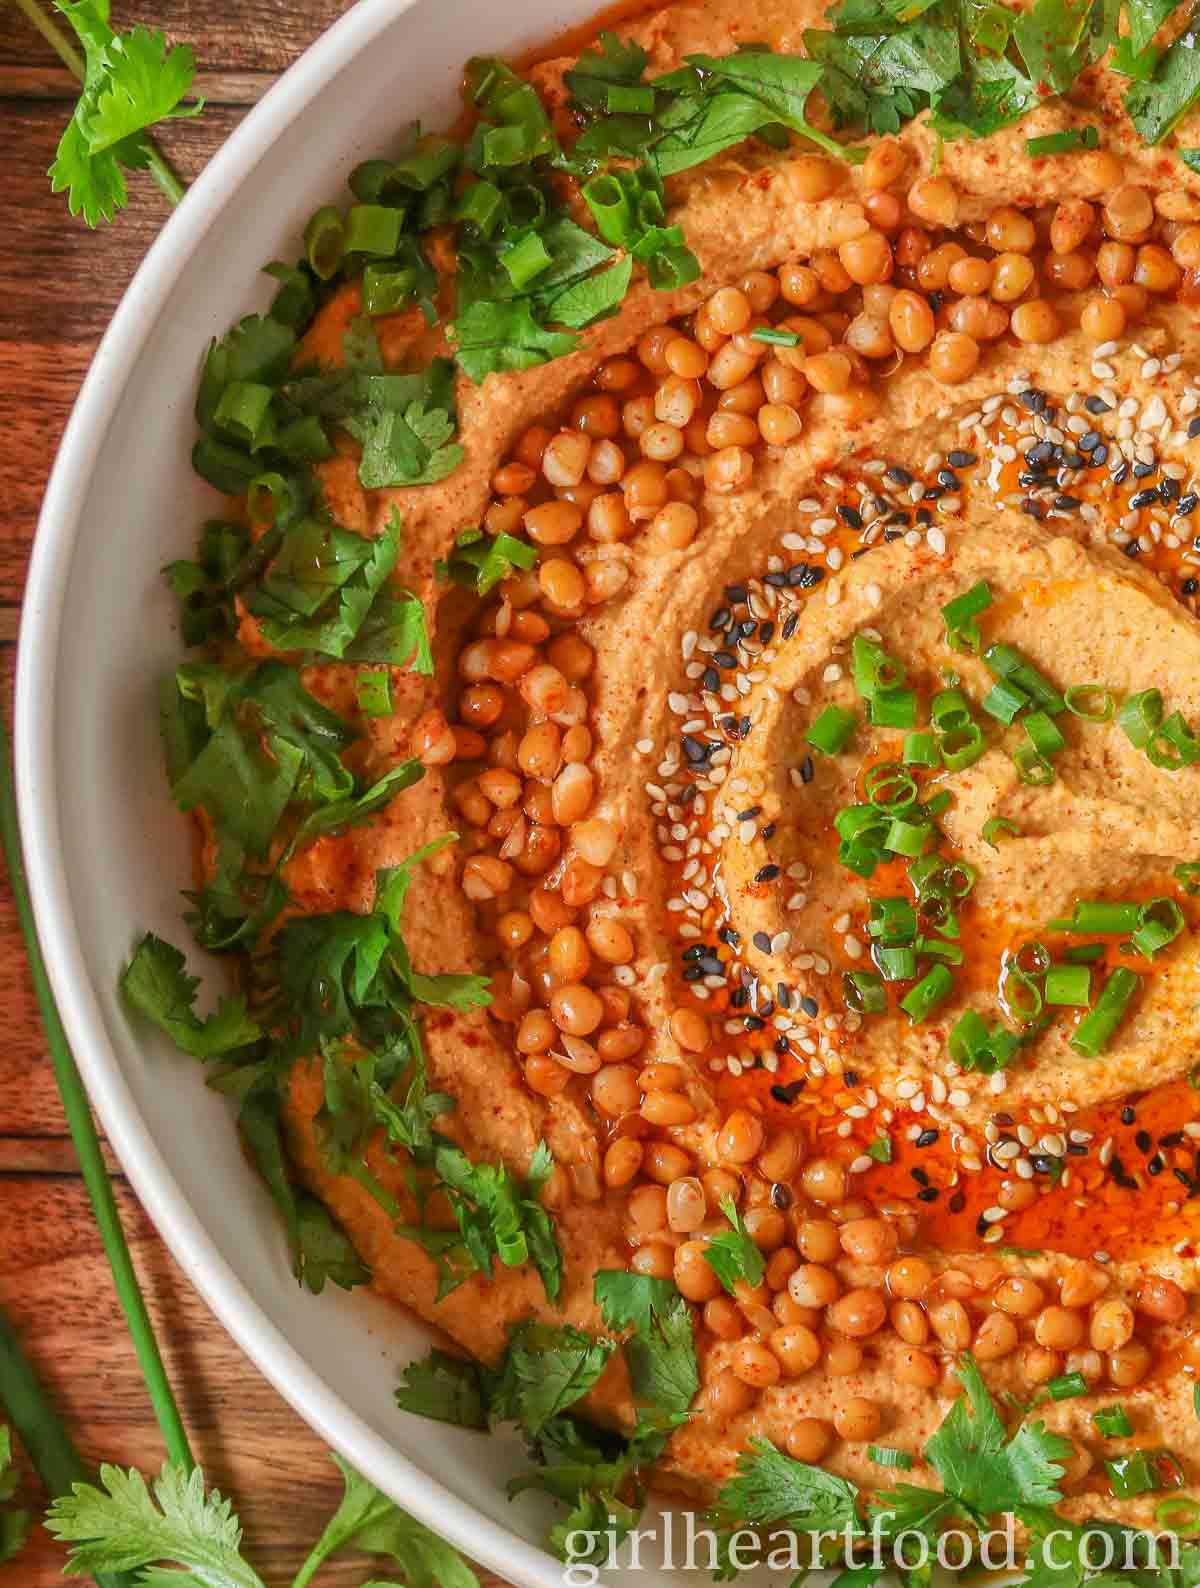 Close-up of the left-hand side of a bowl of garnished lentil hummus.